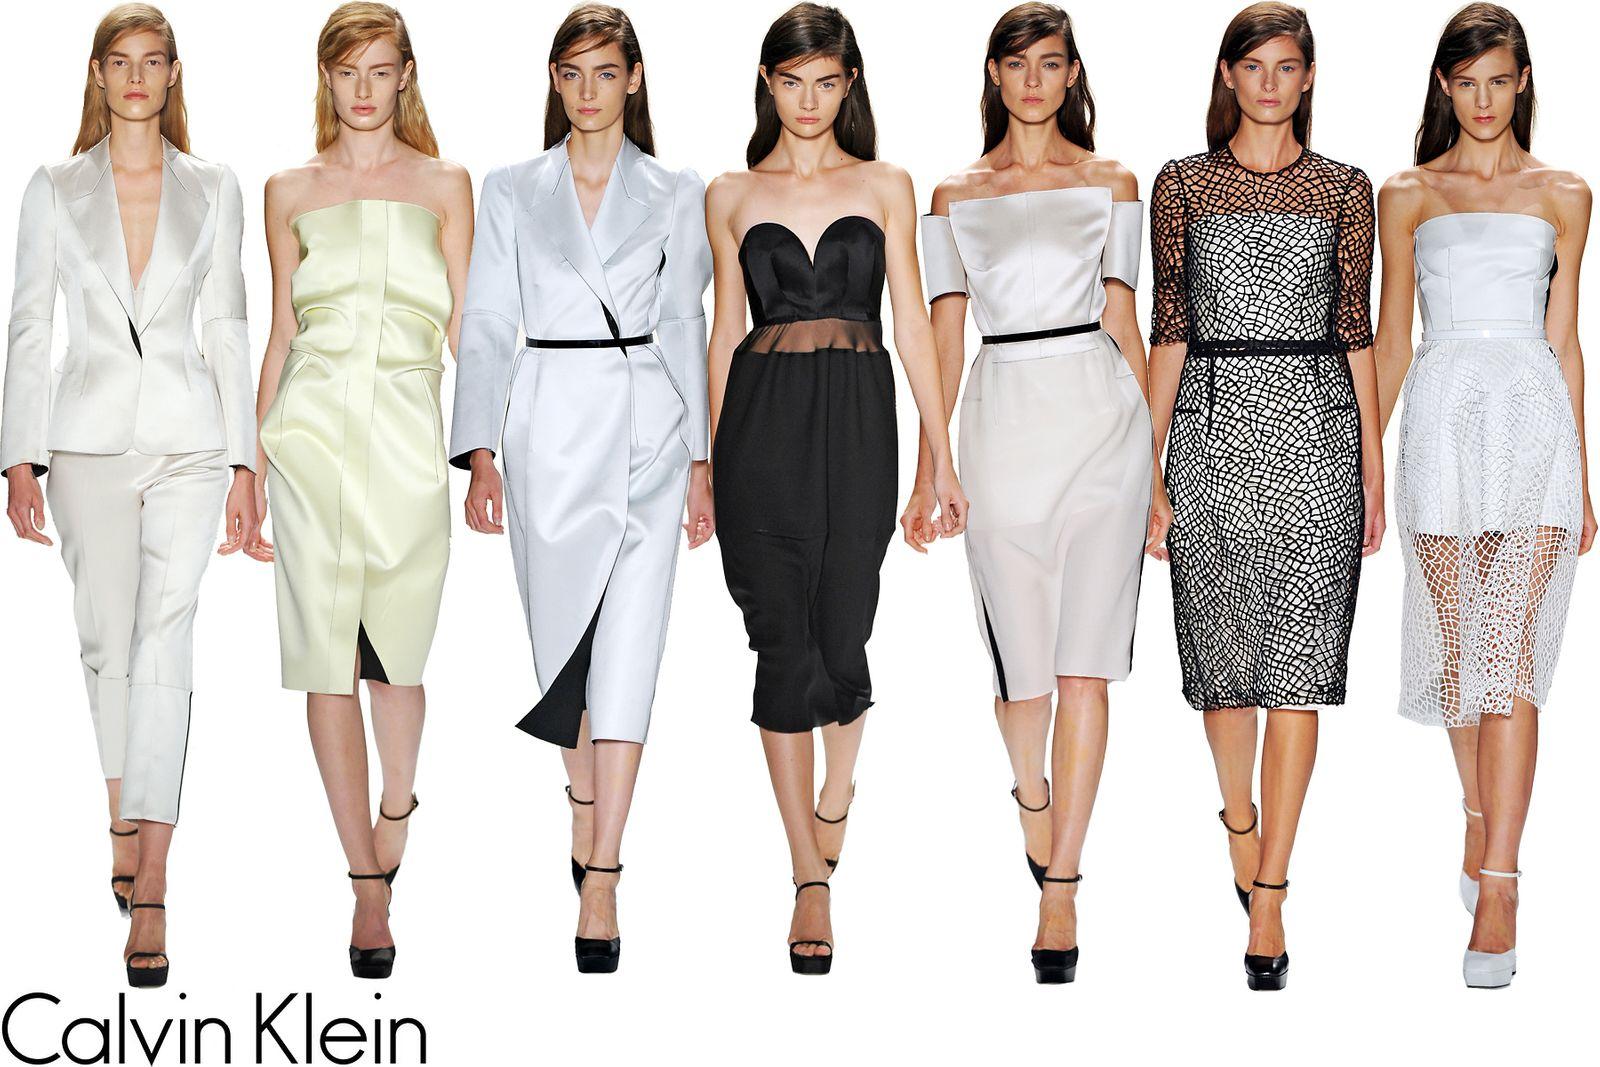 Calvin Klein Spring/Summer 2013 Collection in New York